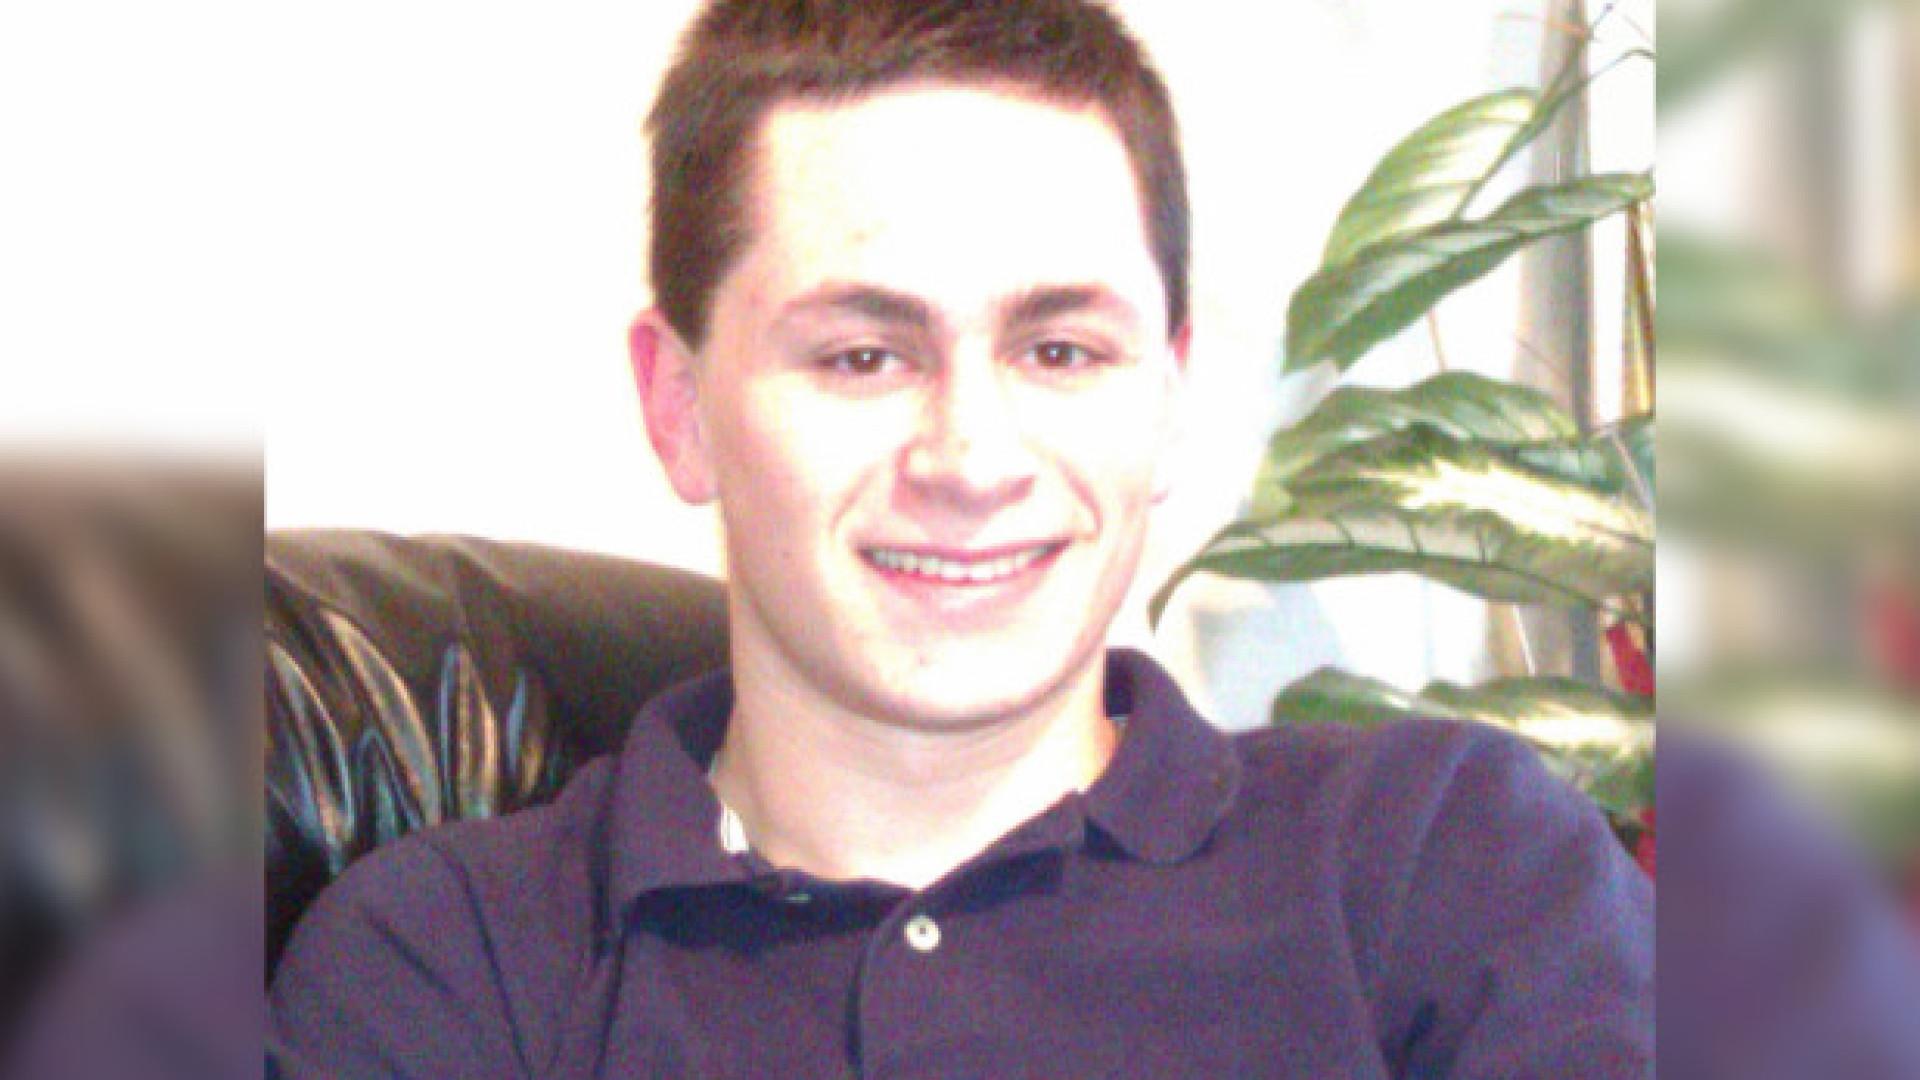 Mark Anthony Conditt. Era este o bombista de Austin